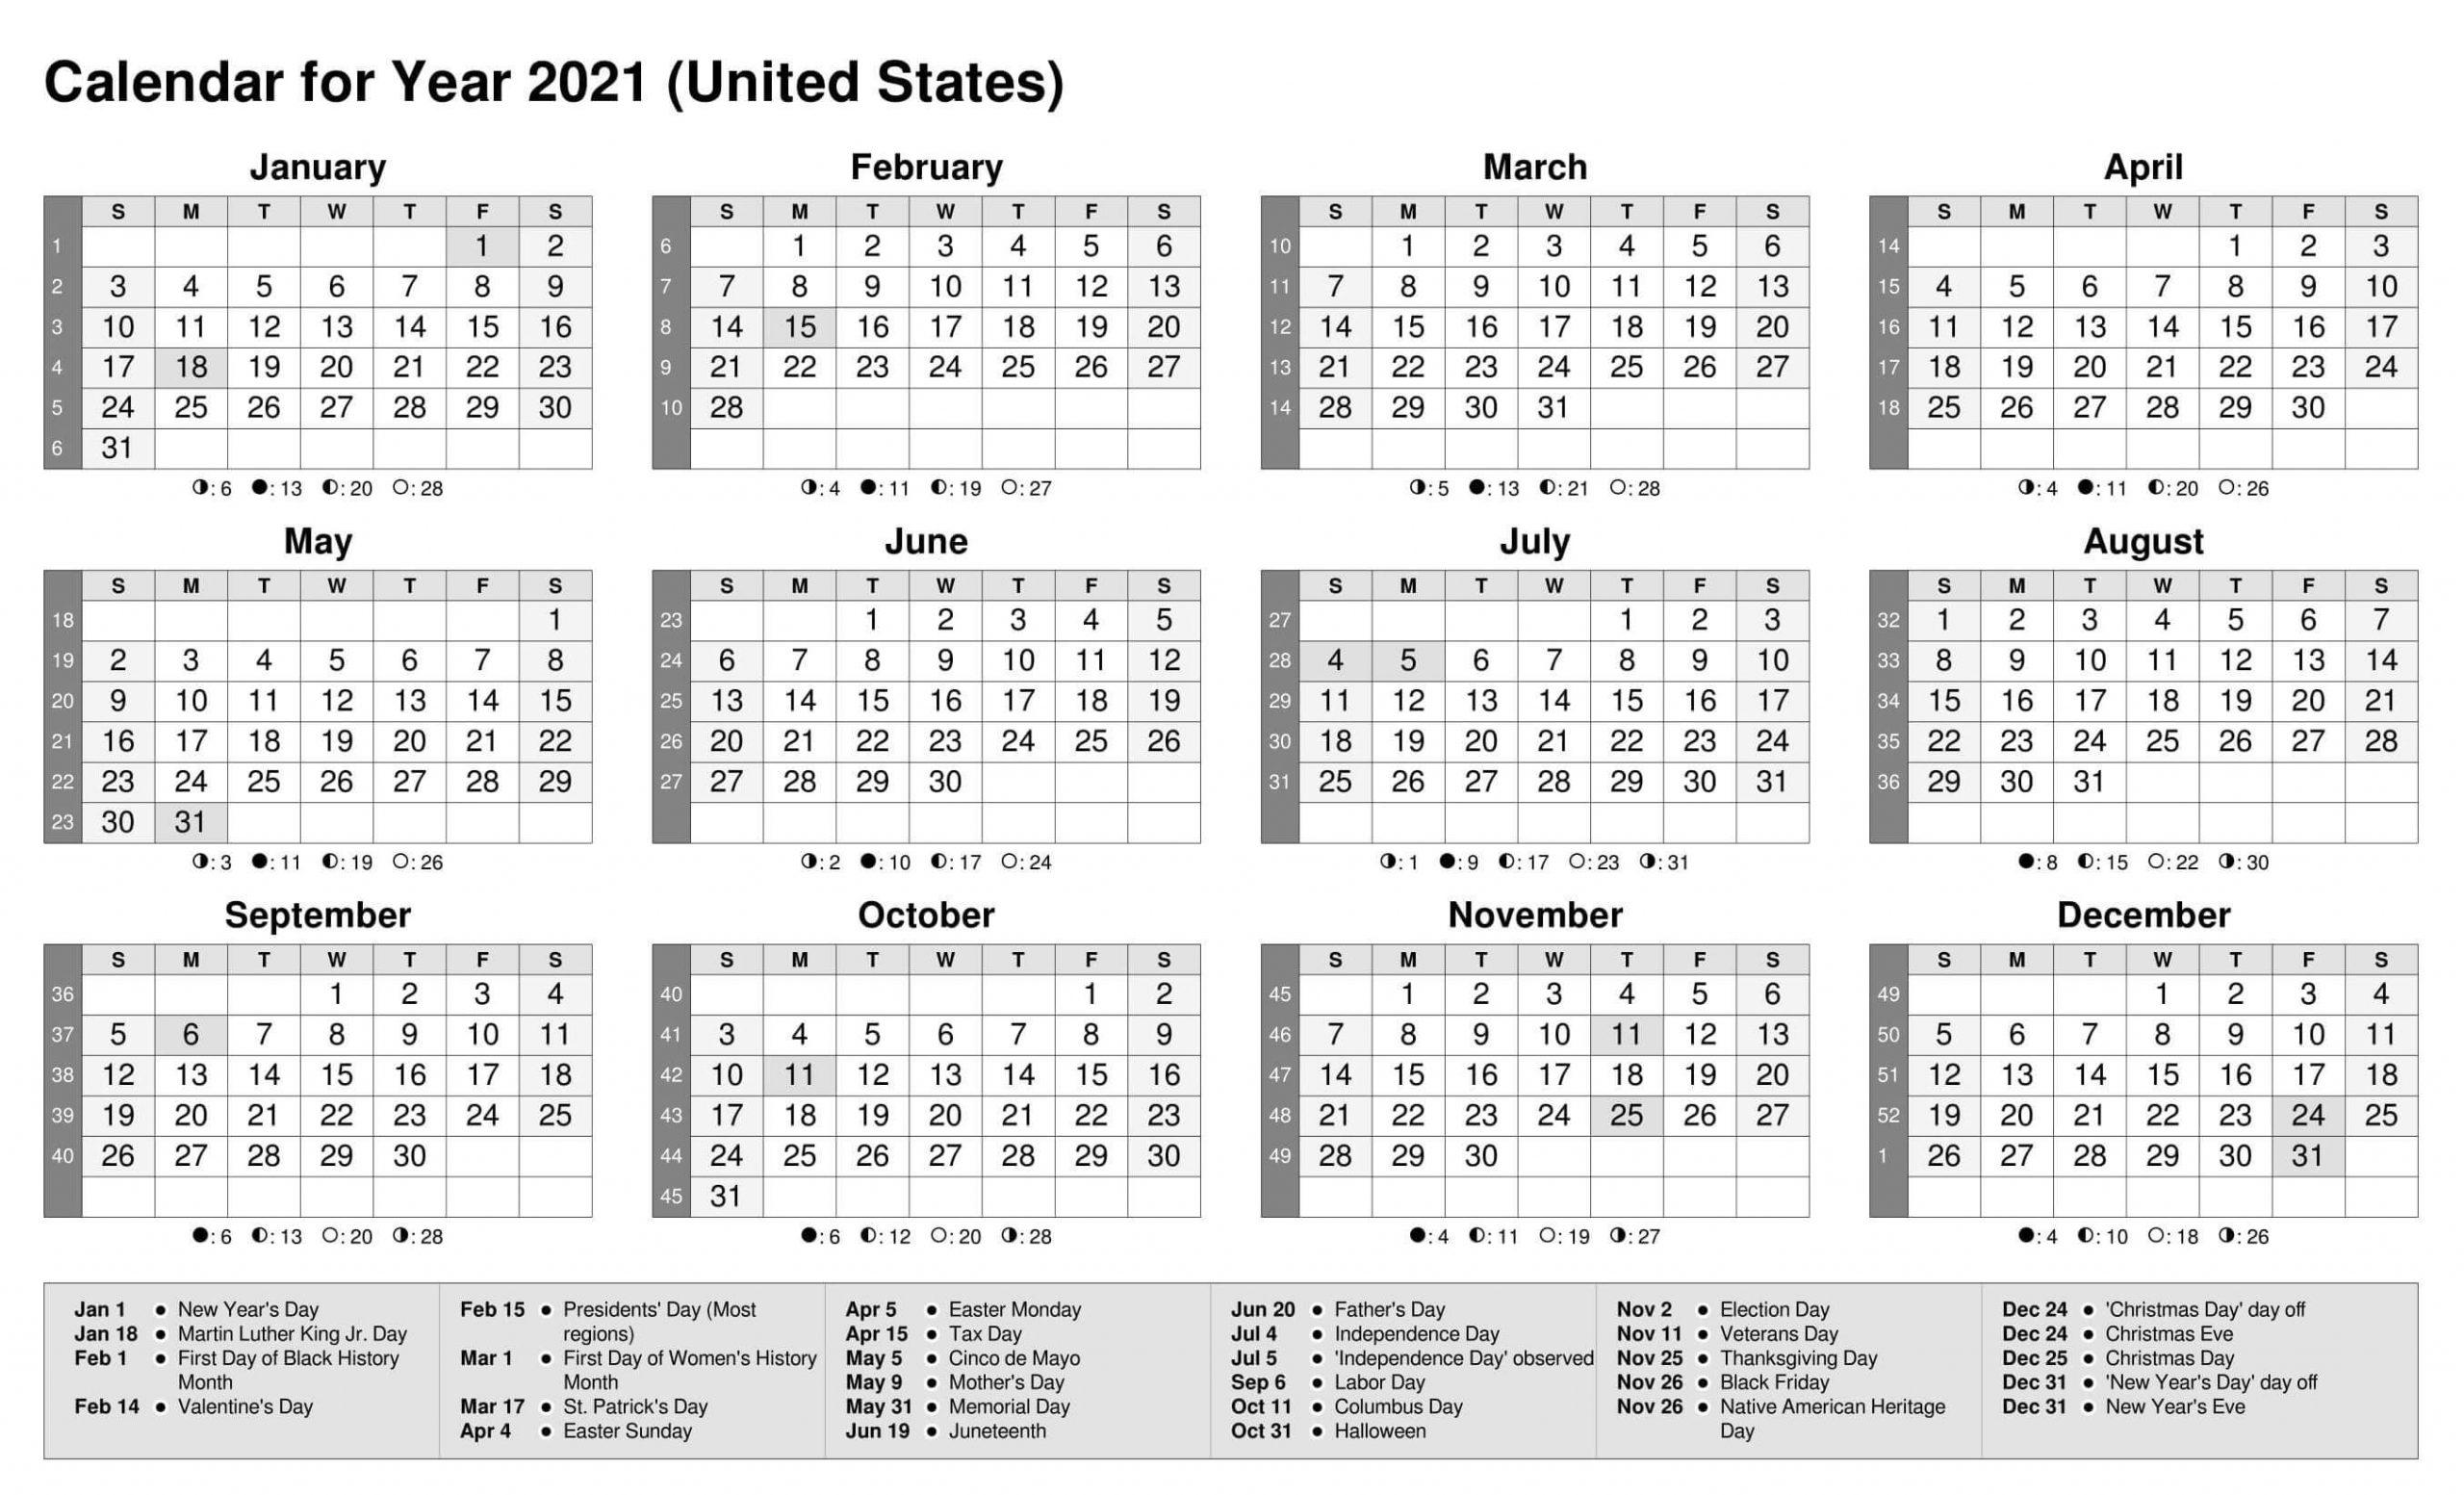 Fiscal Year Calendar 2021 US